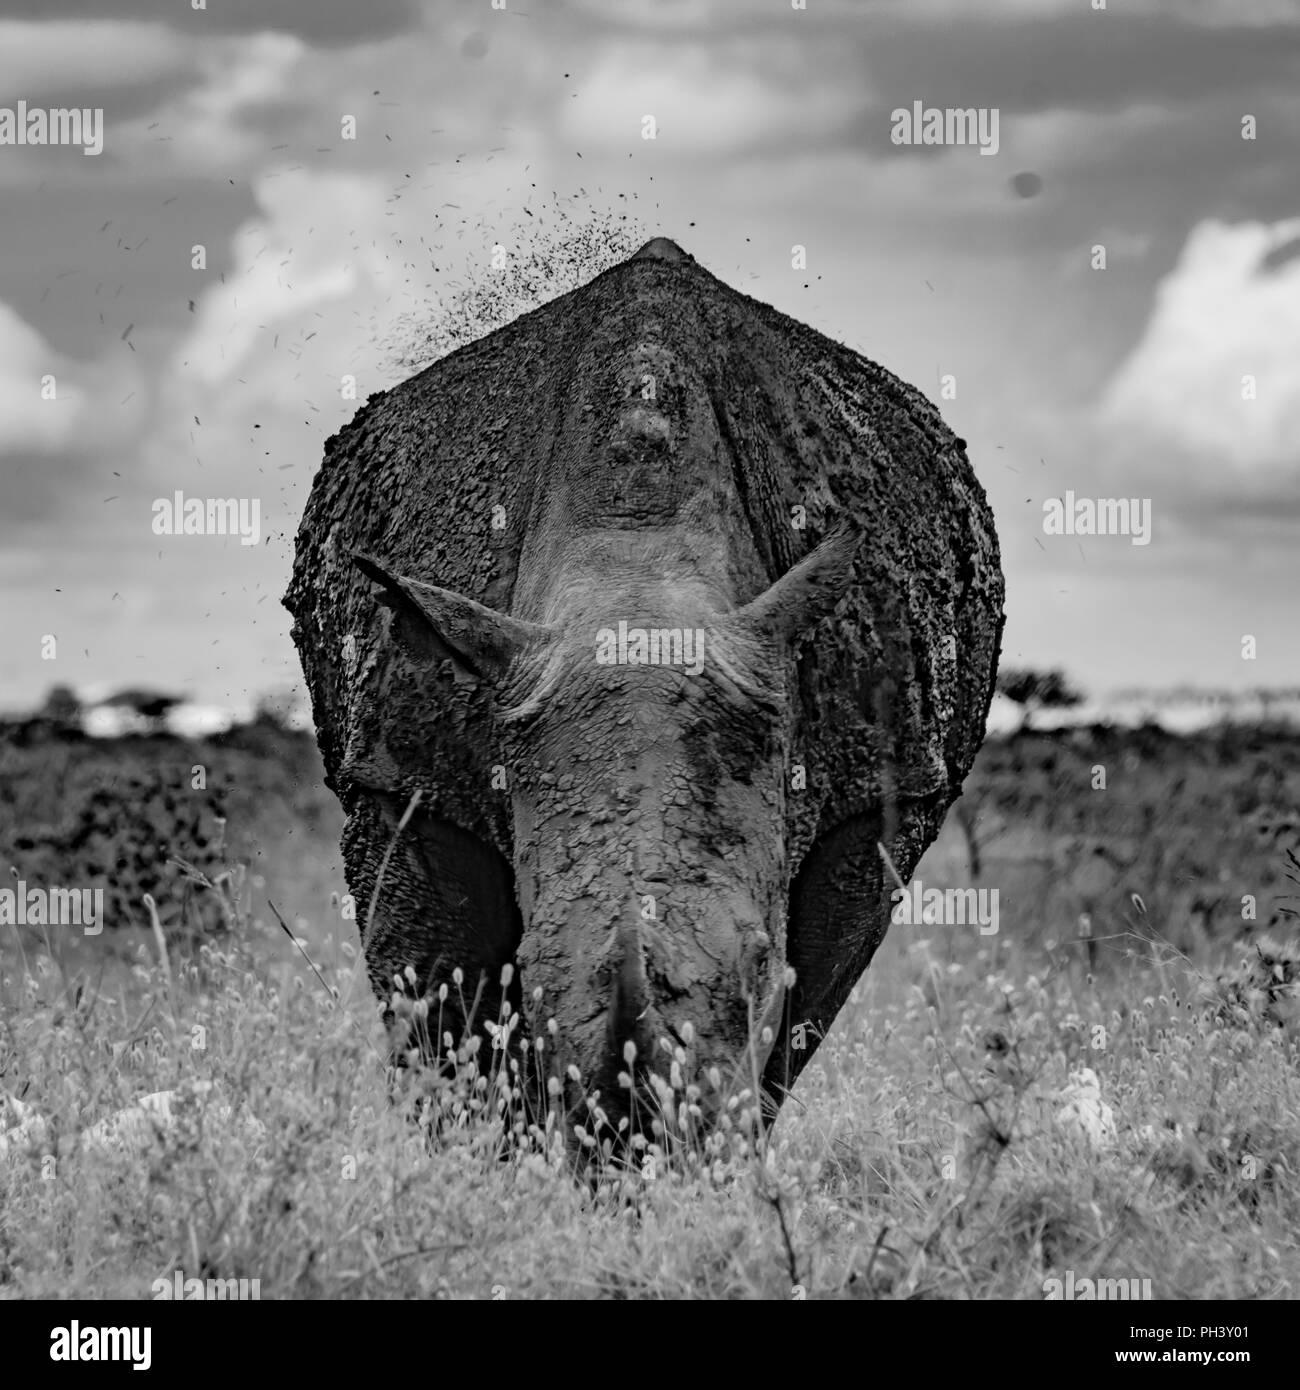 Un rhinocéros dans la boue Photo Stock